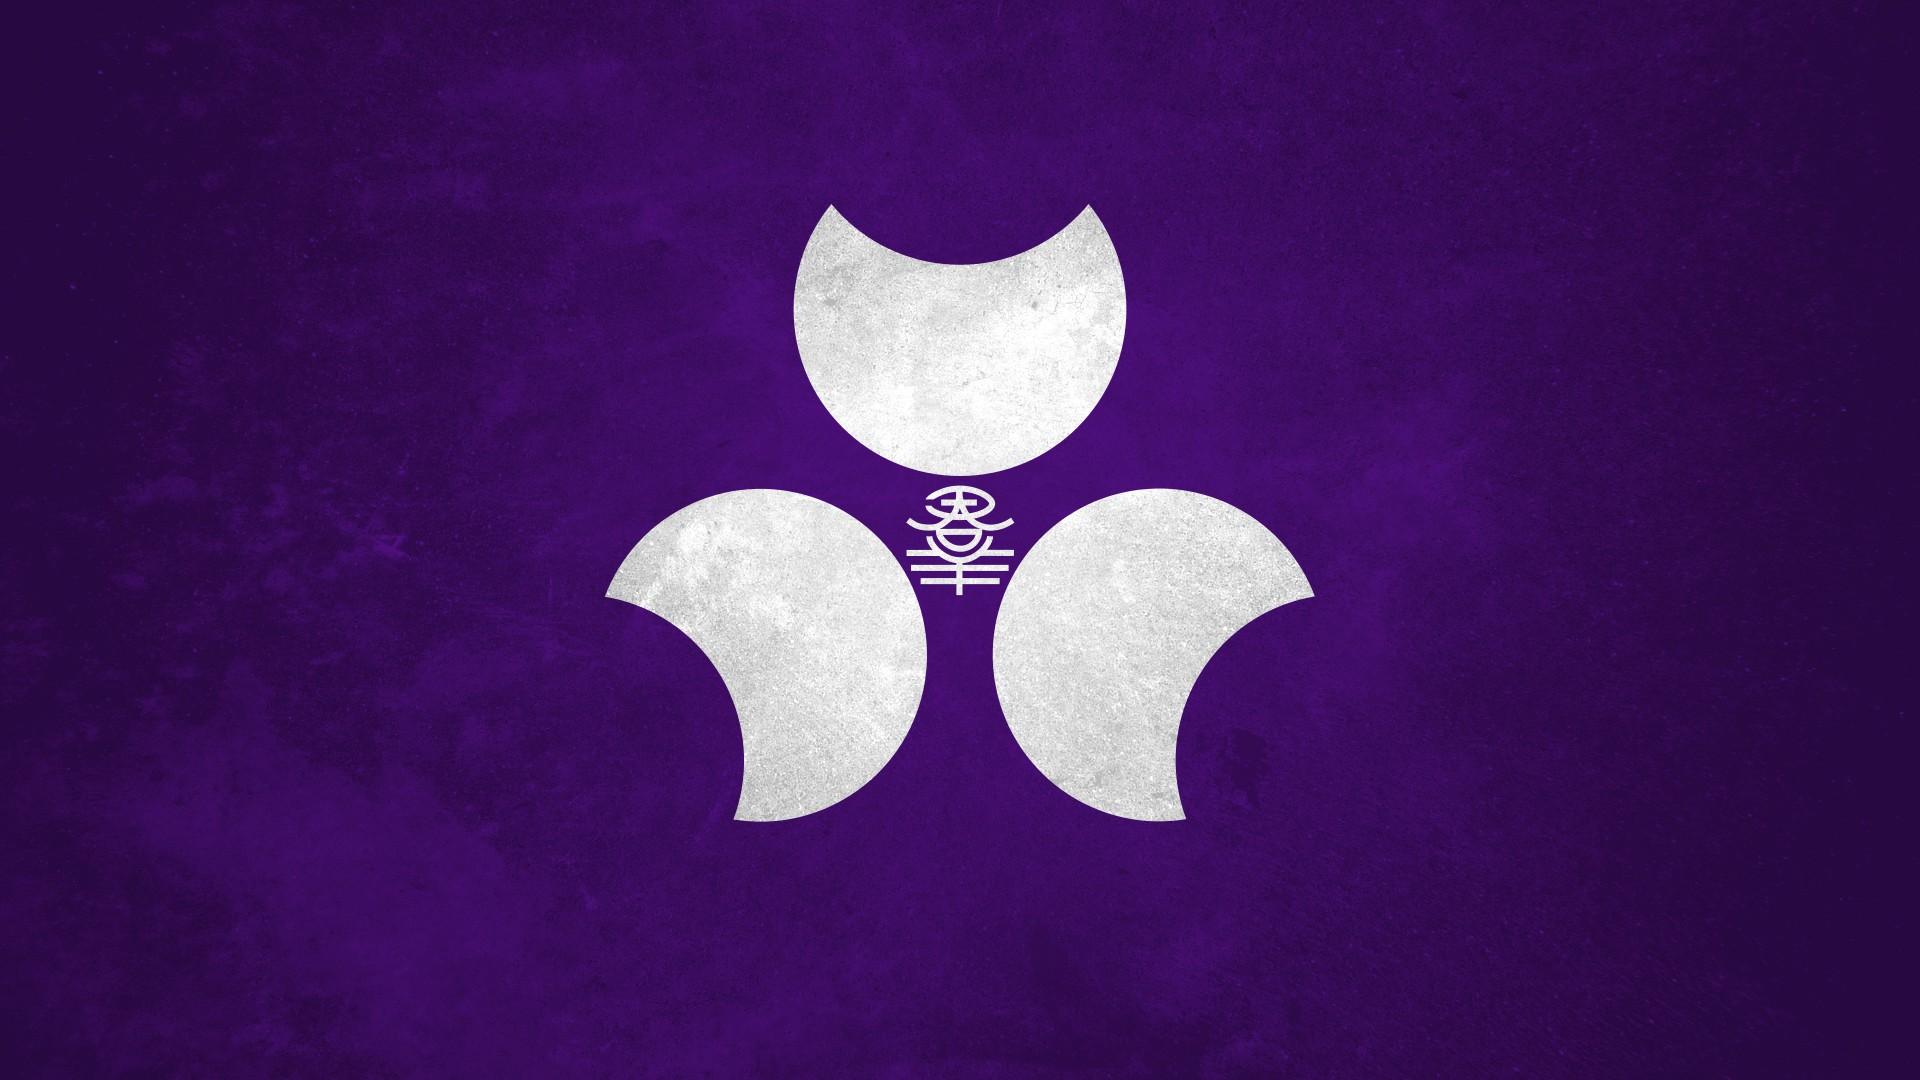 https://get.wallhere.com/photo/Japan-illustration-heart-text-logo-flag-moustache-circle-Gunma-Prefecture-symbol-number-font-organ-crescent-103281.jpg